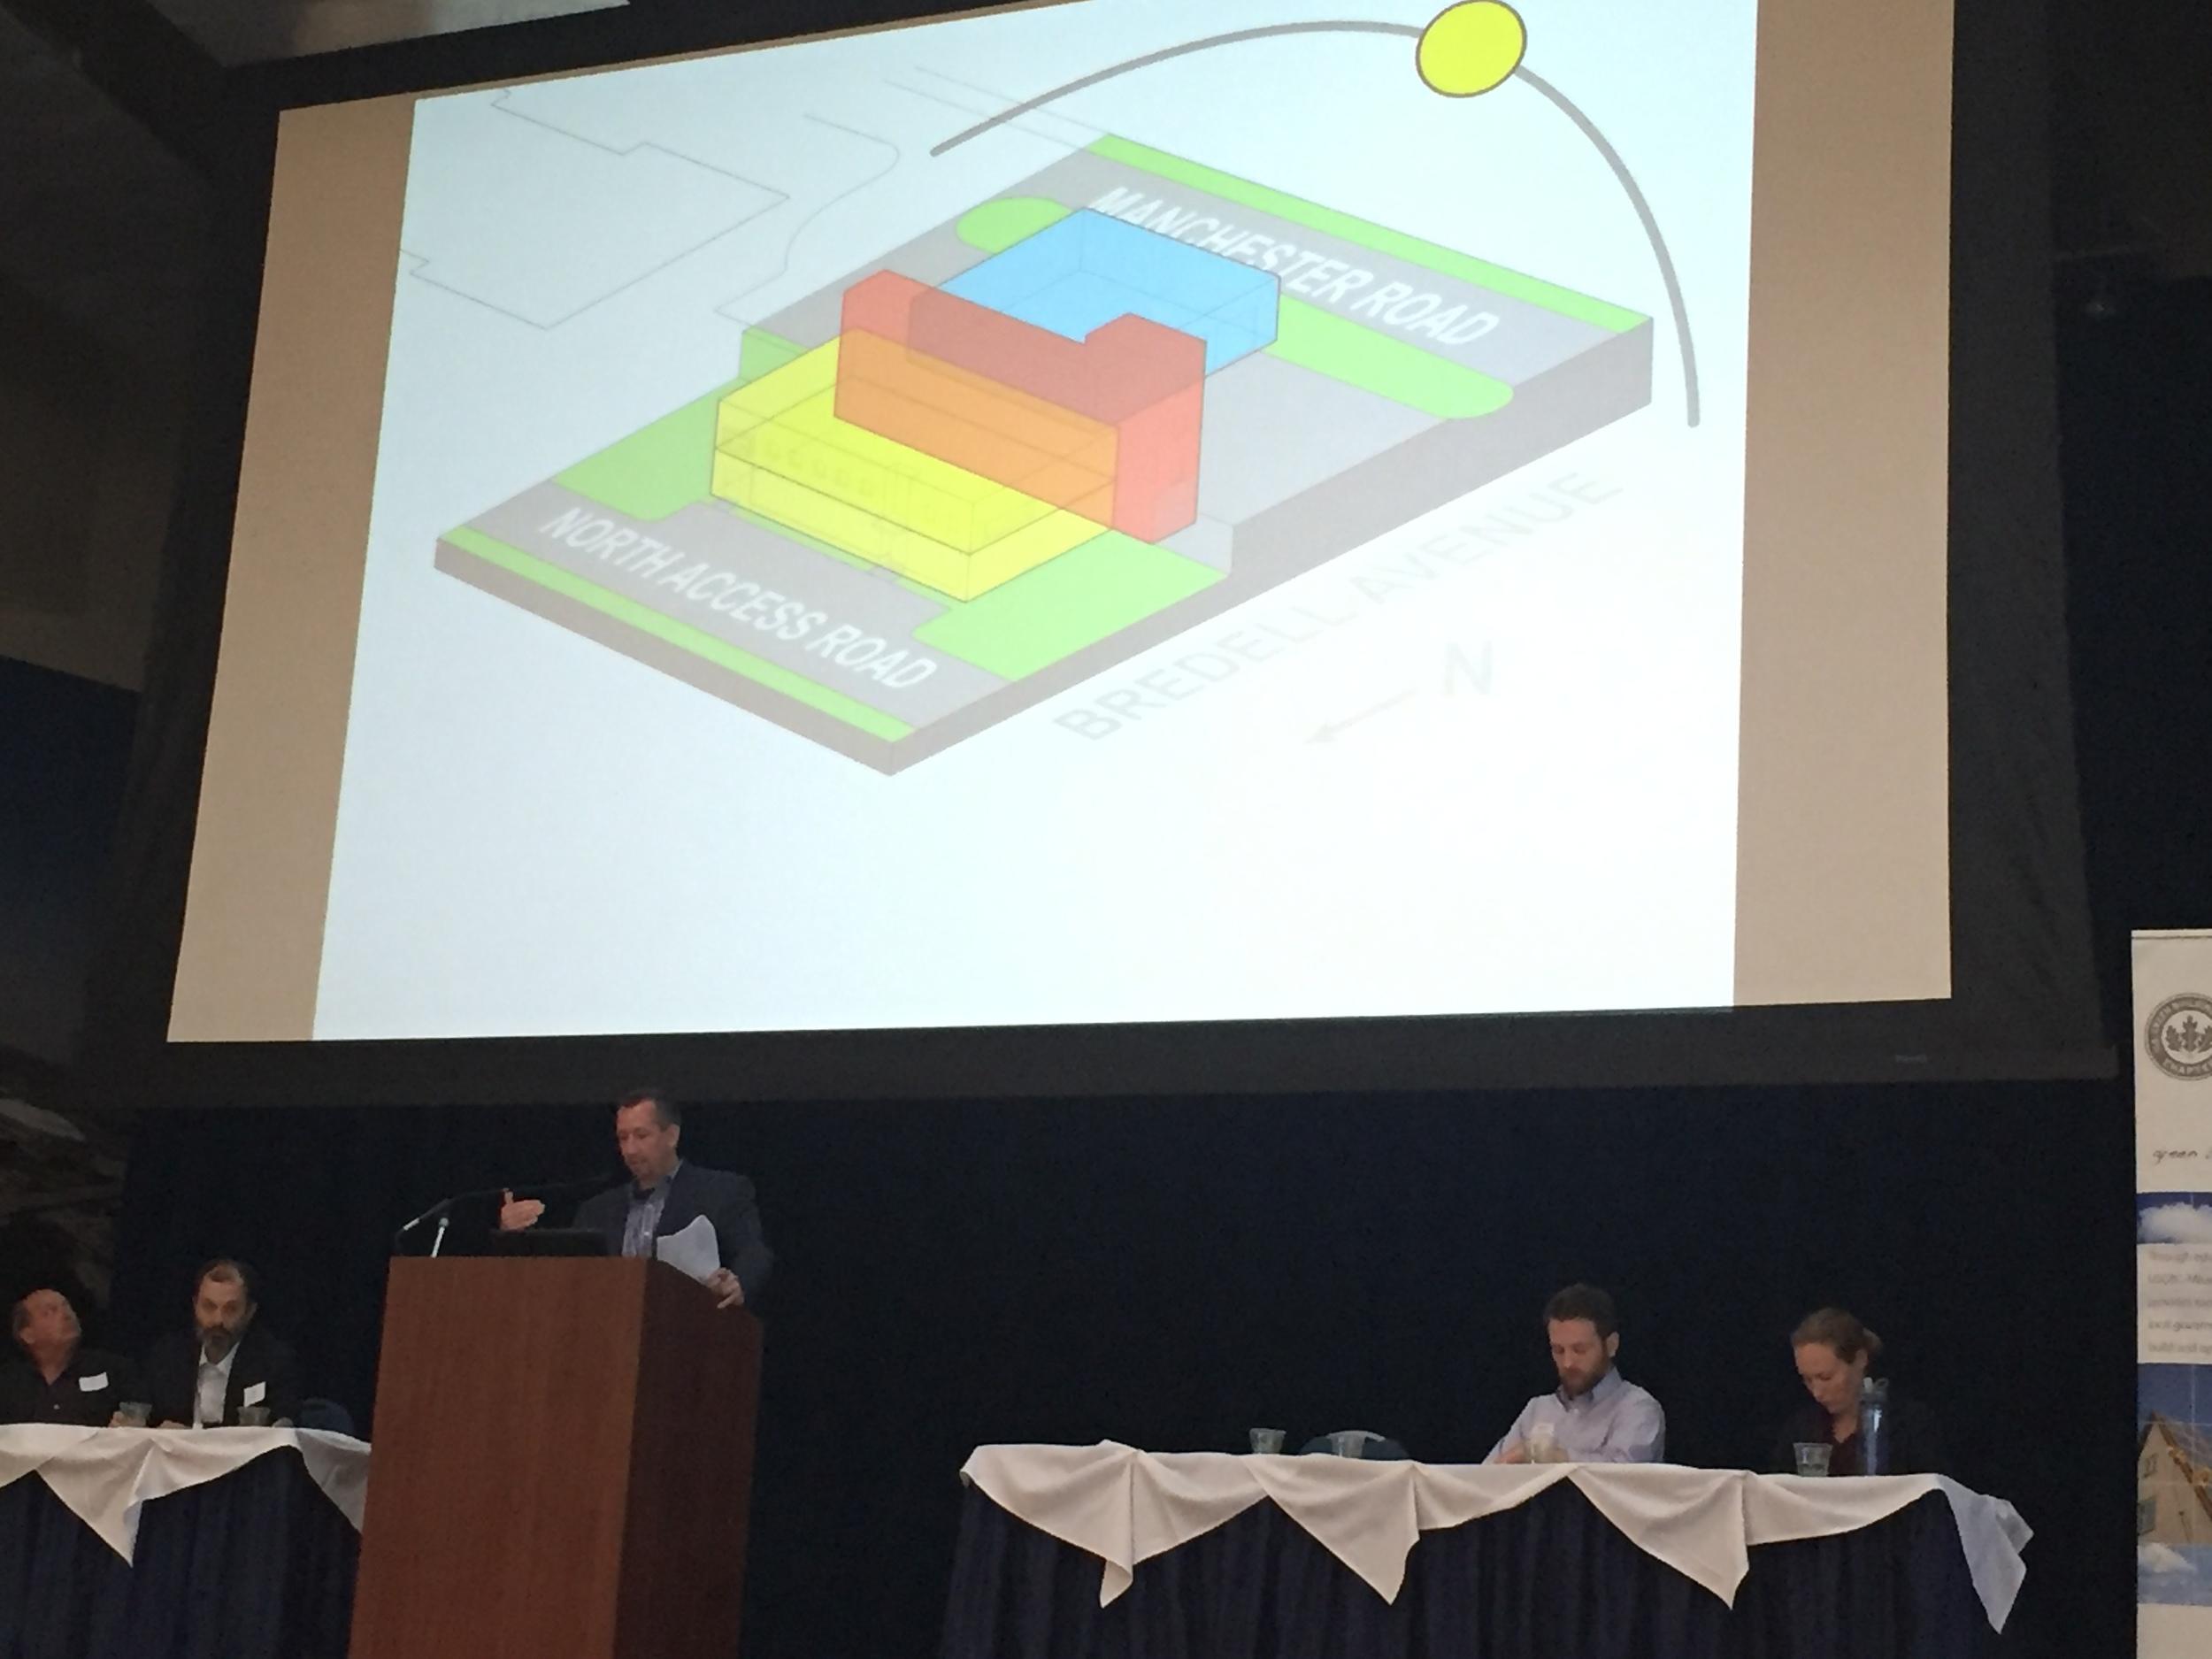 Jon Emert, Partner, JEMA, presents at the USGBC Missouri Chapter -